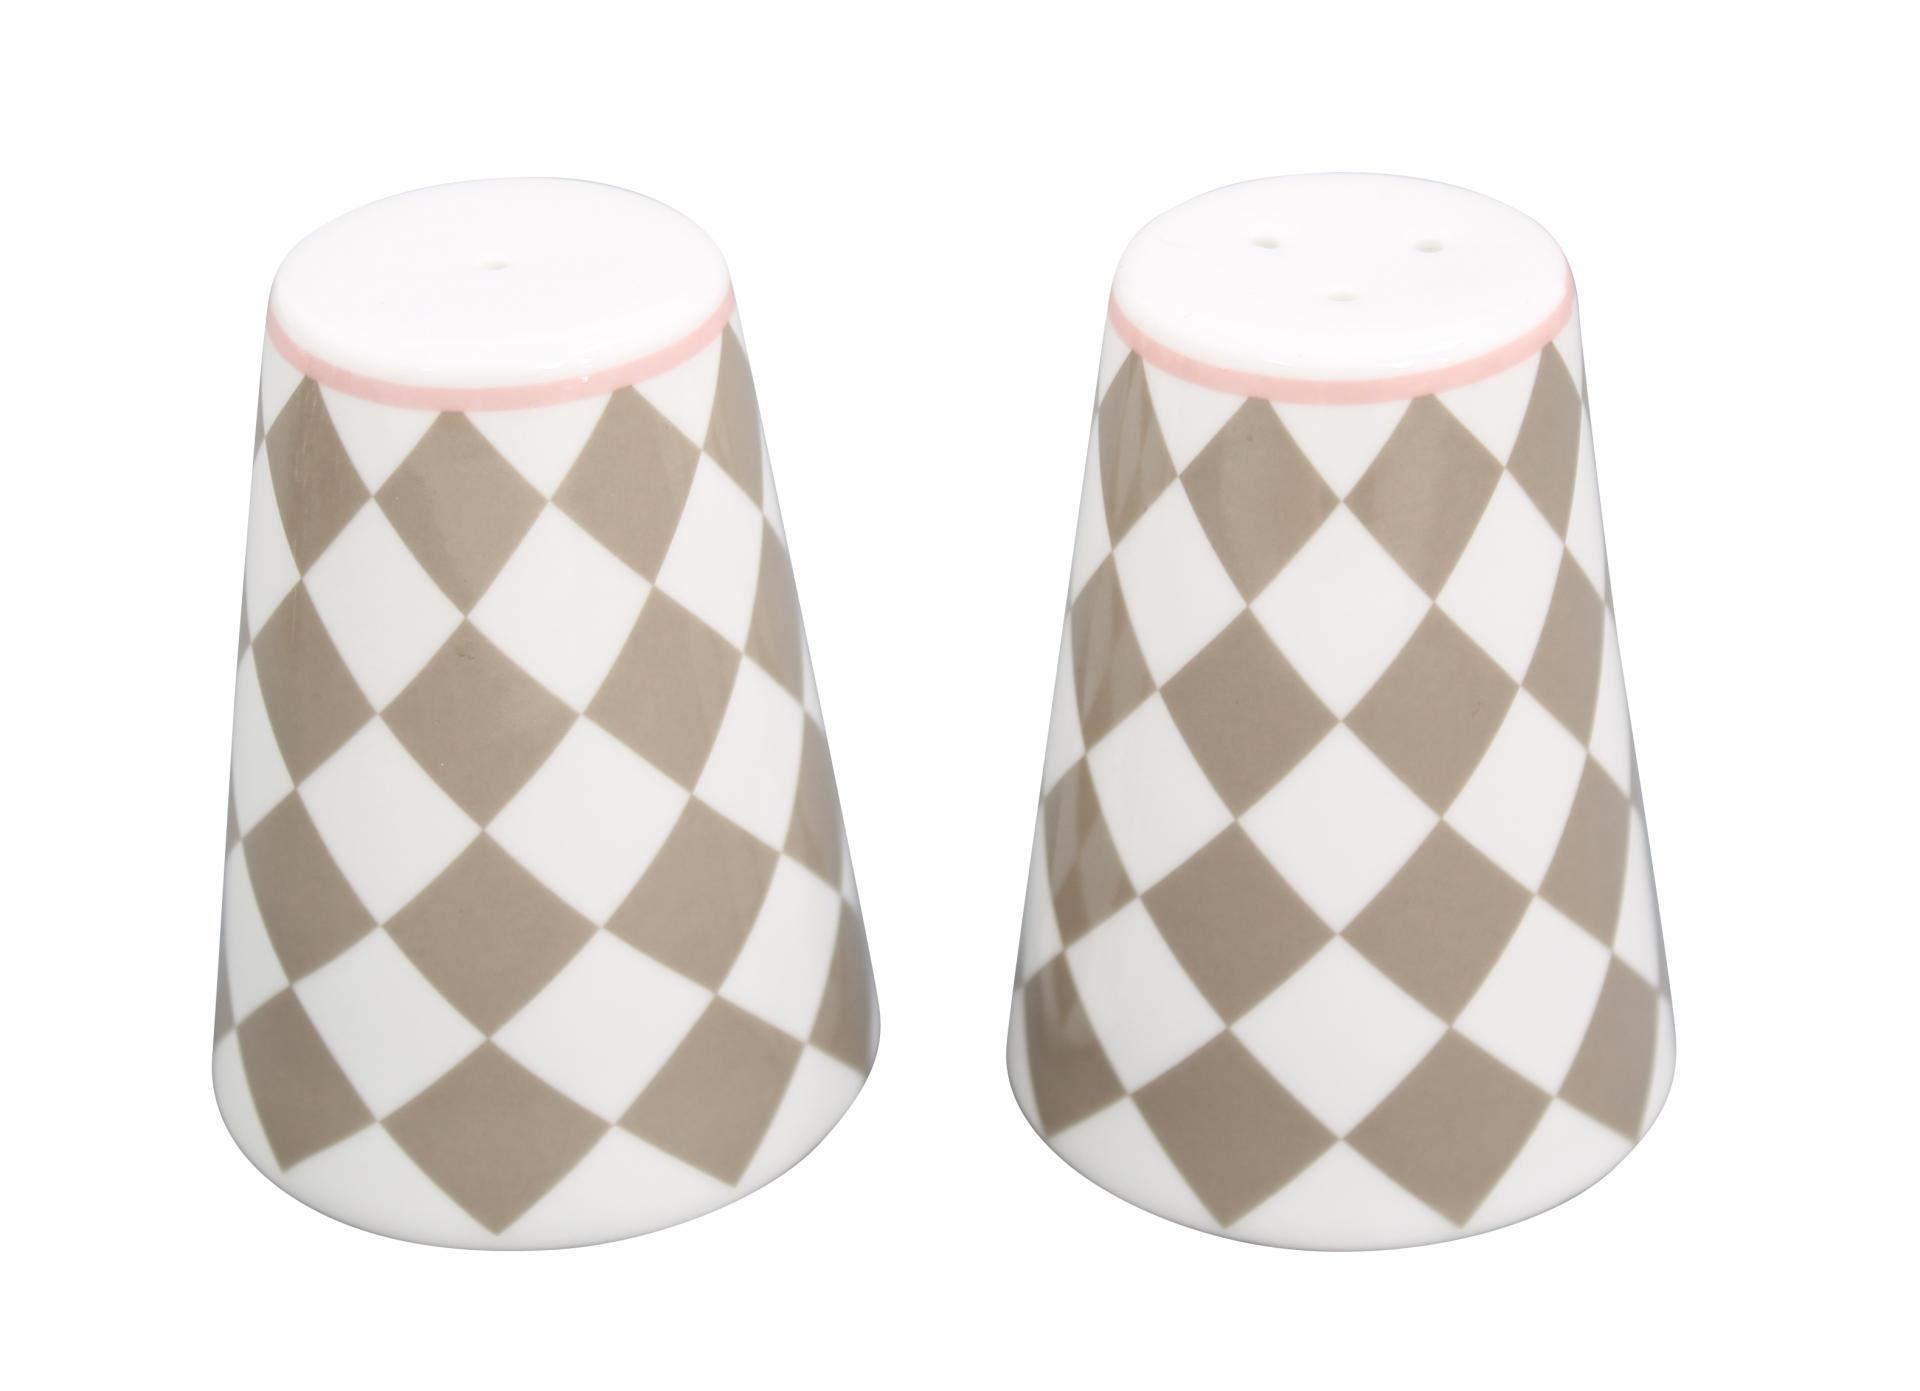 Krasilnikoff Solnička a pepřenka Taupe harlekin, béžová barva, šedá barva, porcelán